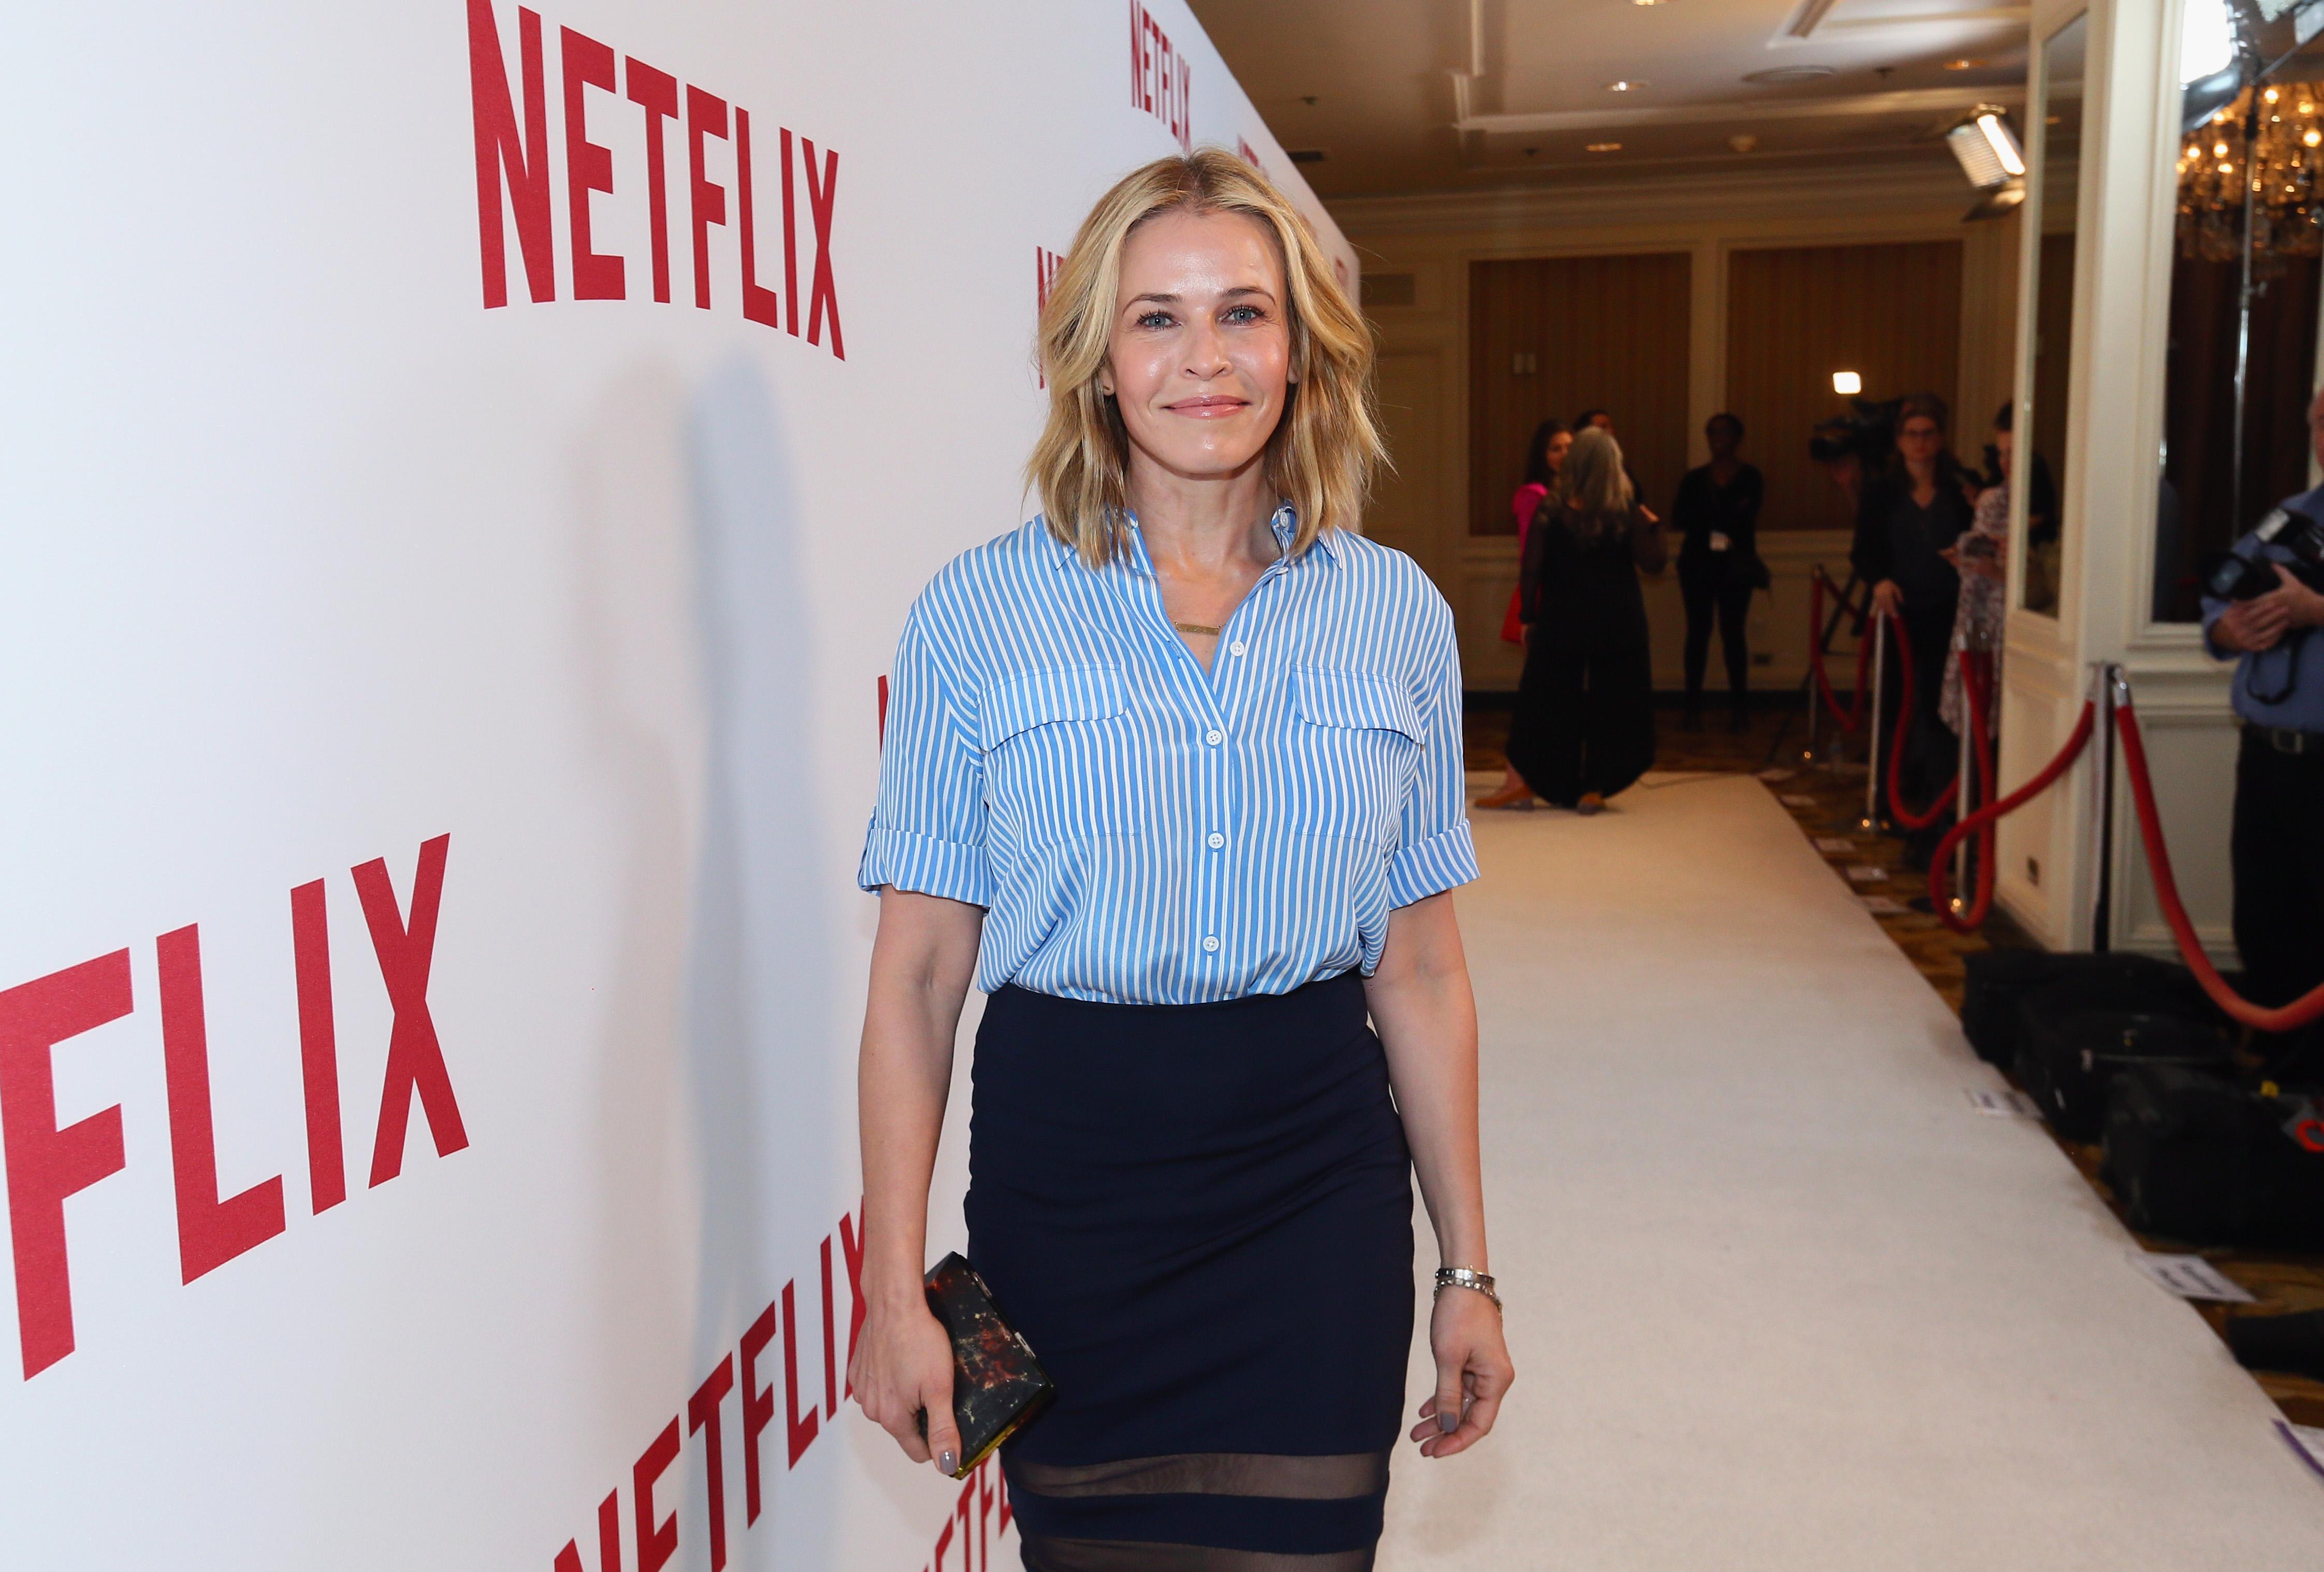 Chelsea Handler Talks Not Wanting Kids On Her Netflix